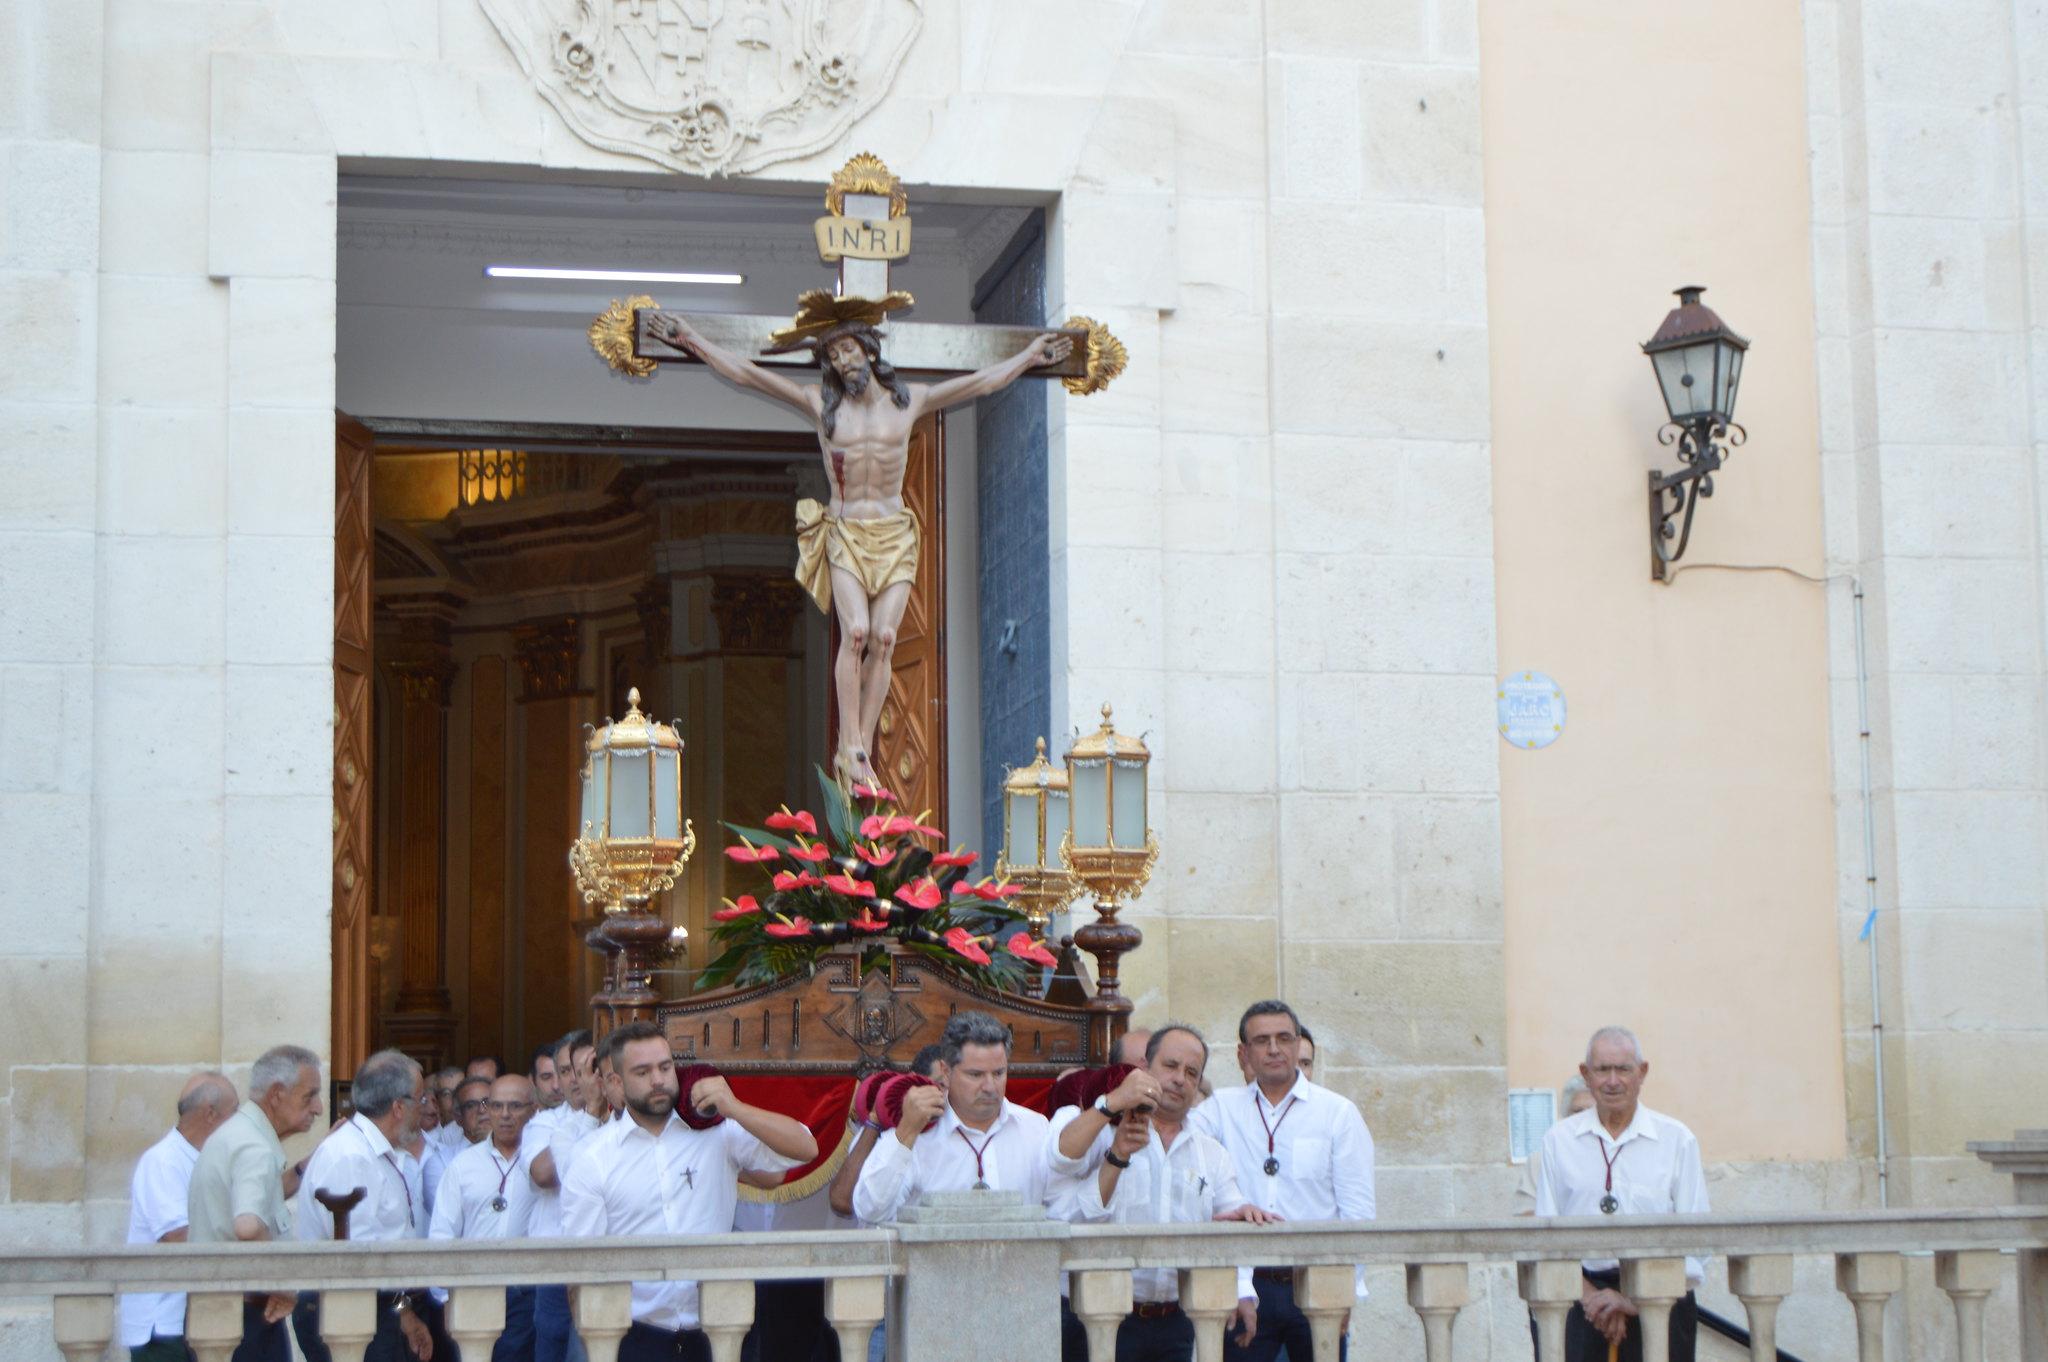 (2017-07-02) Procesión de subida (Adrián Romero Montesinos) (3)